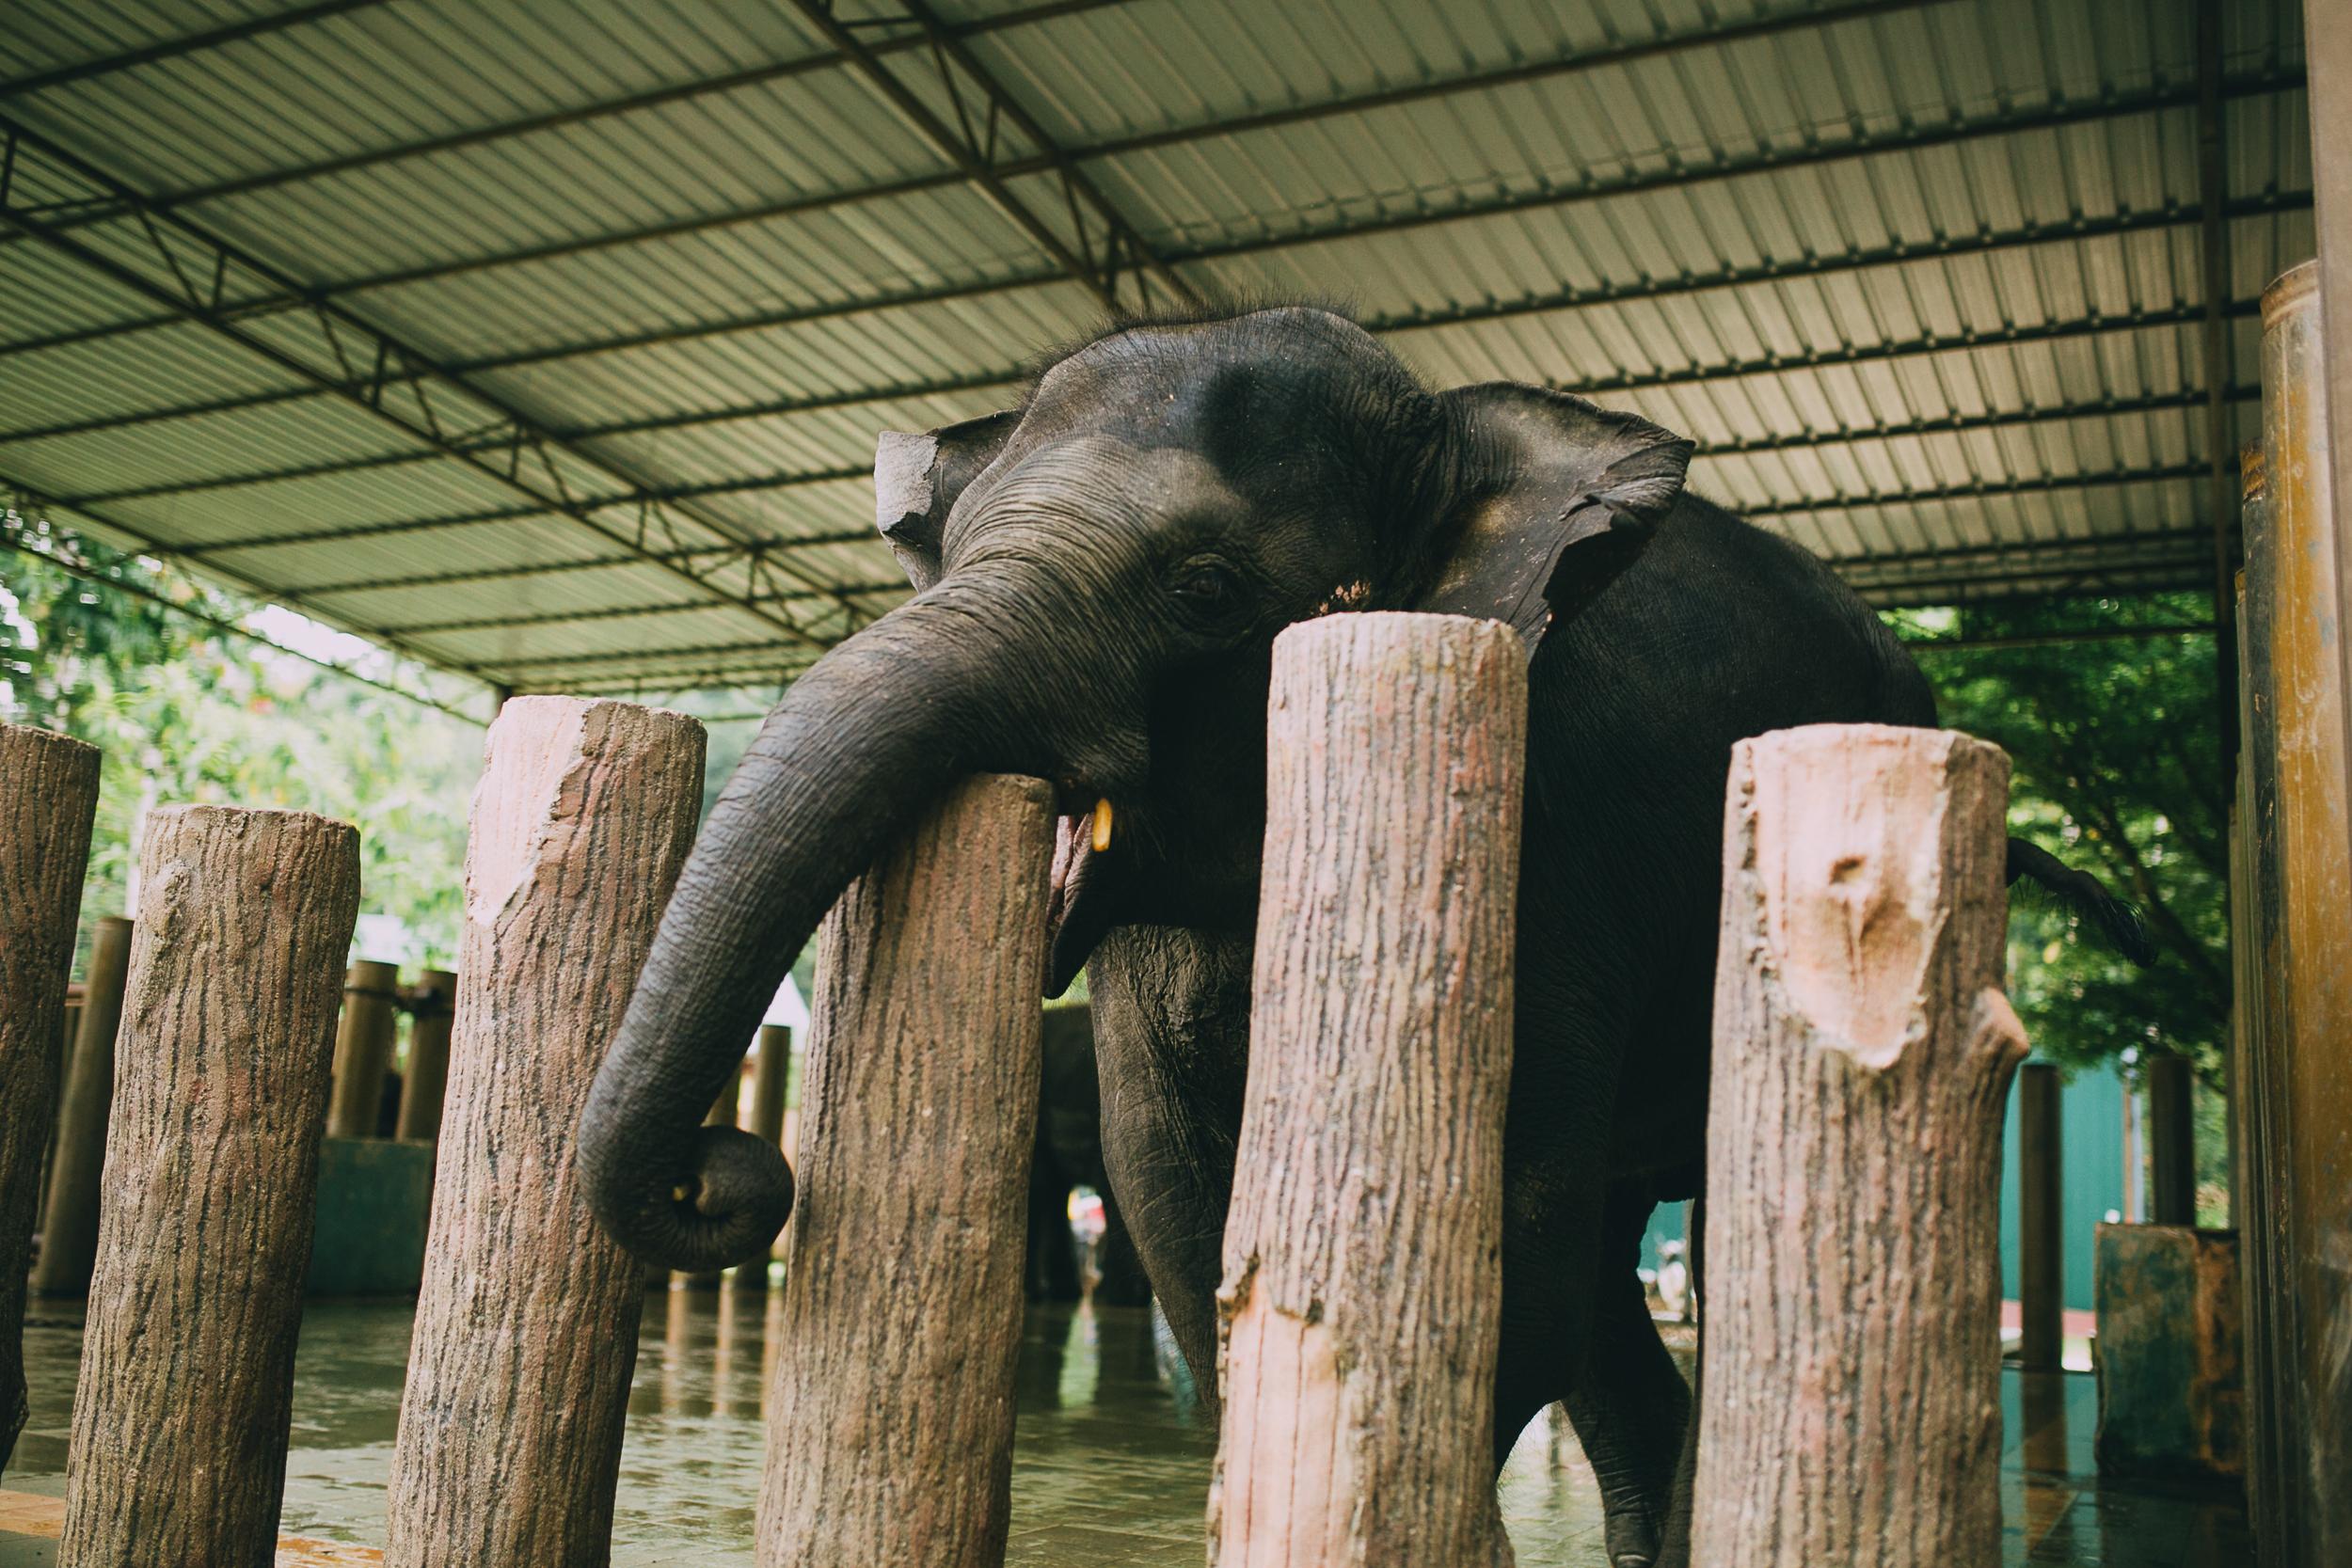 elephant _ kendell tyne photography